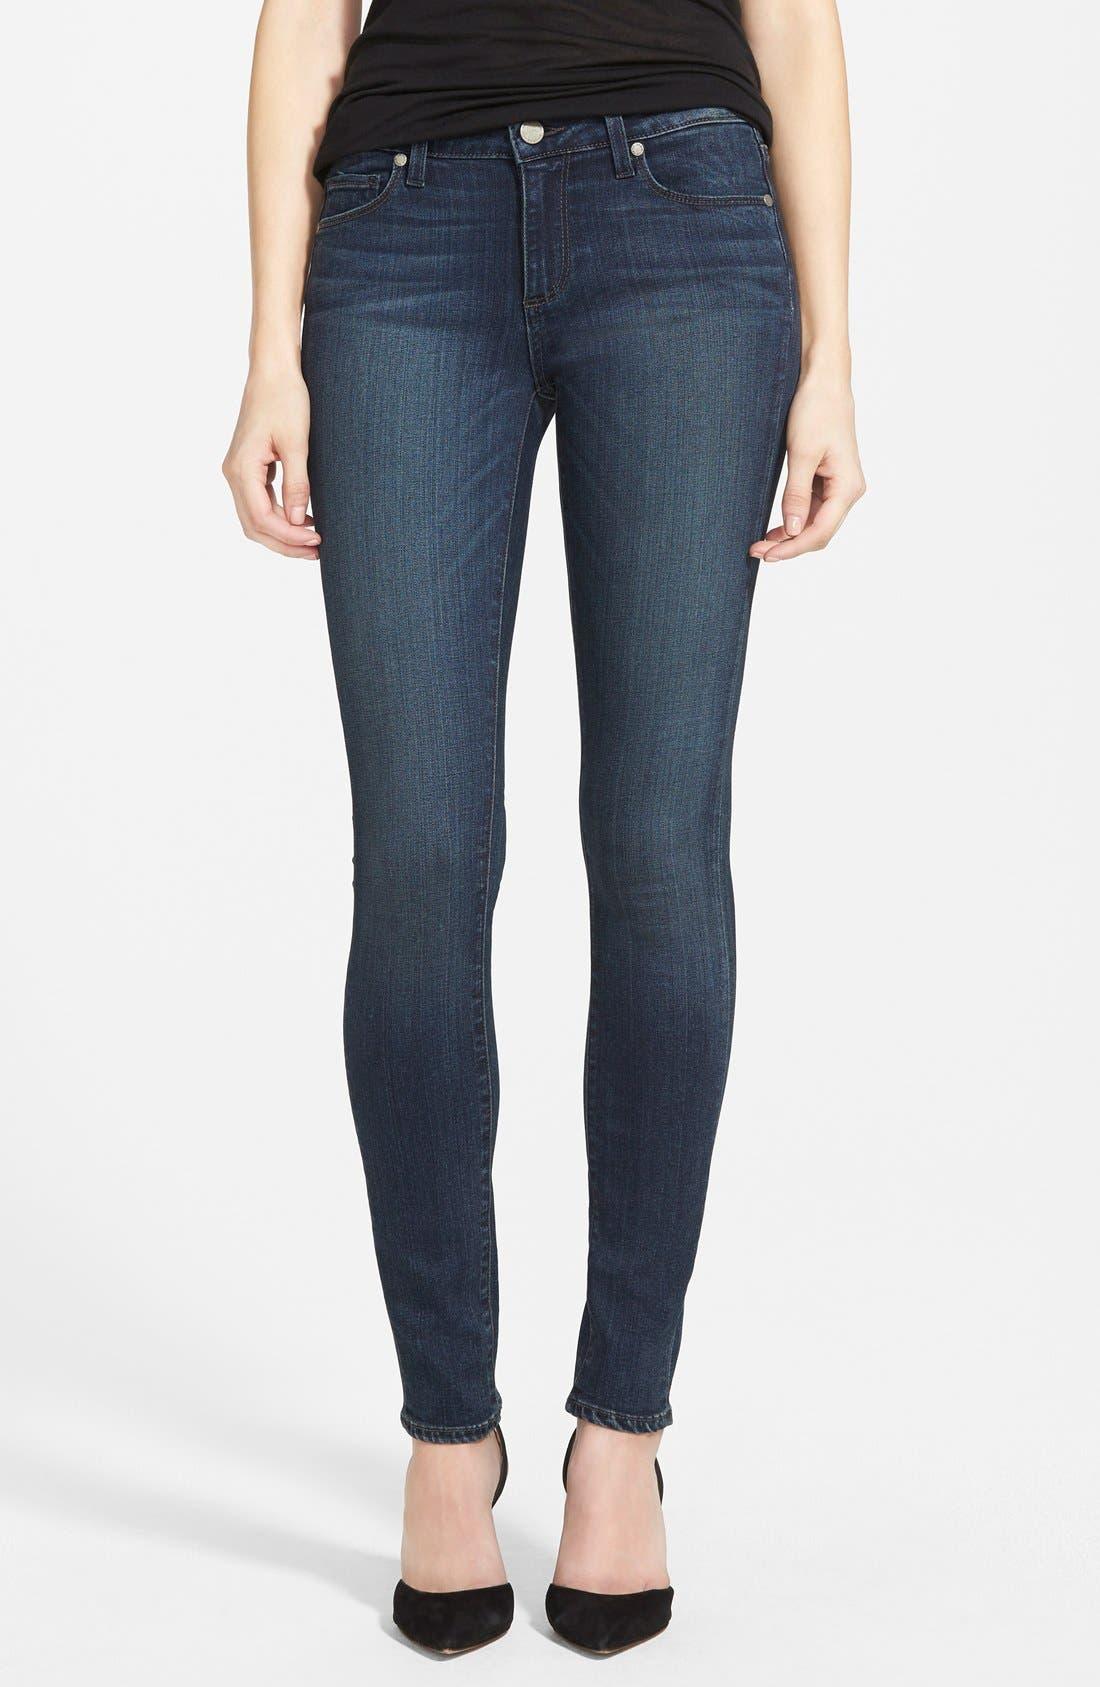 Main Image - Paige Denim 'Transcend - Verdugo' Ultra Skinny Jeans (Franklin)